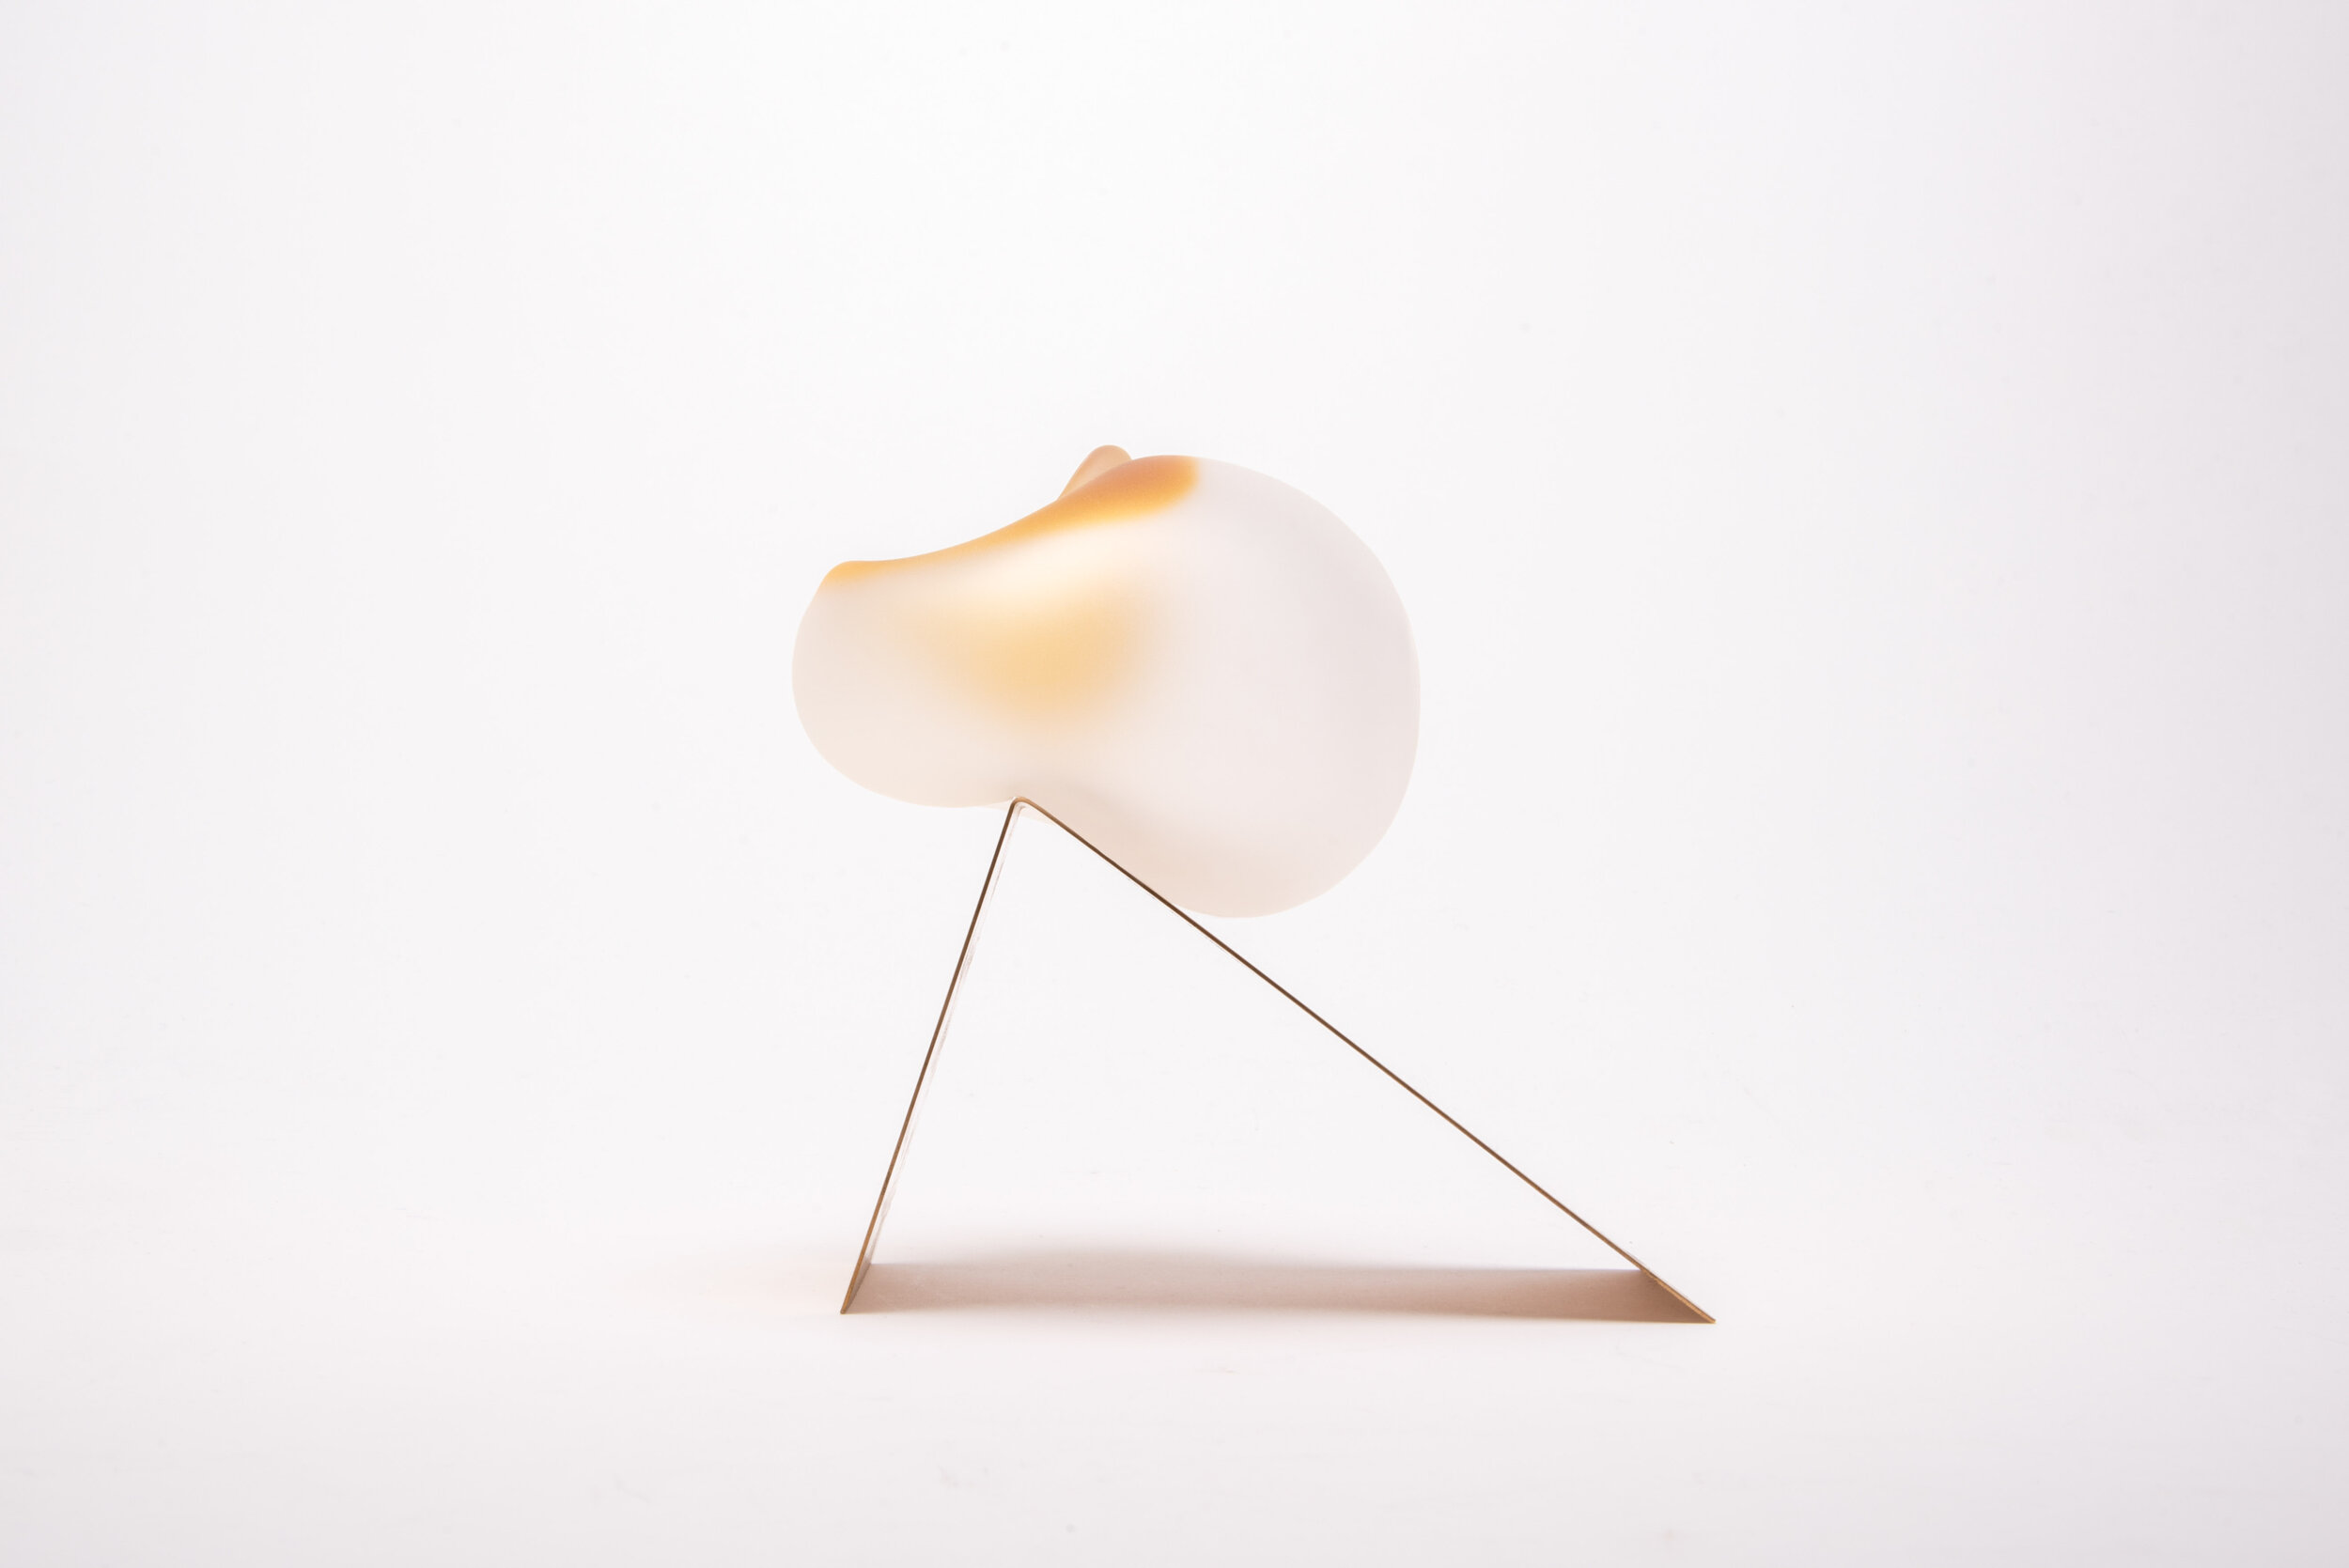 Jinya, ZHAO, 'non-existent existenceⅢ', 2019, 15x16x12cm, Hao Ma.jpg